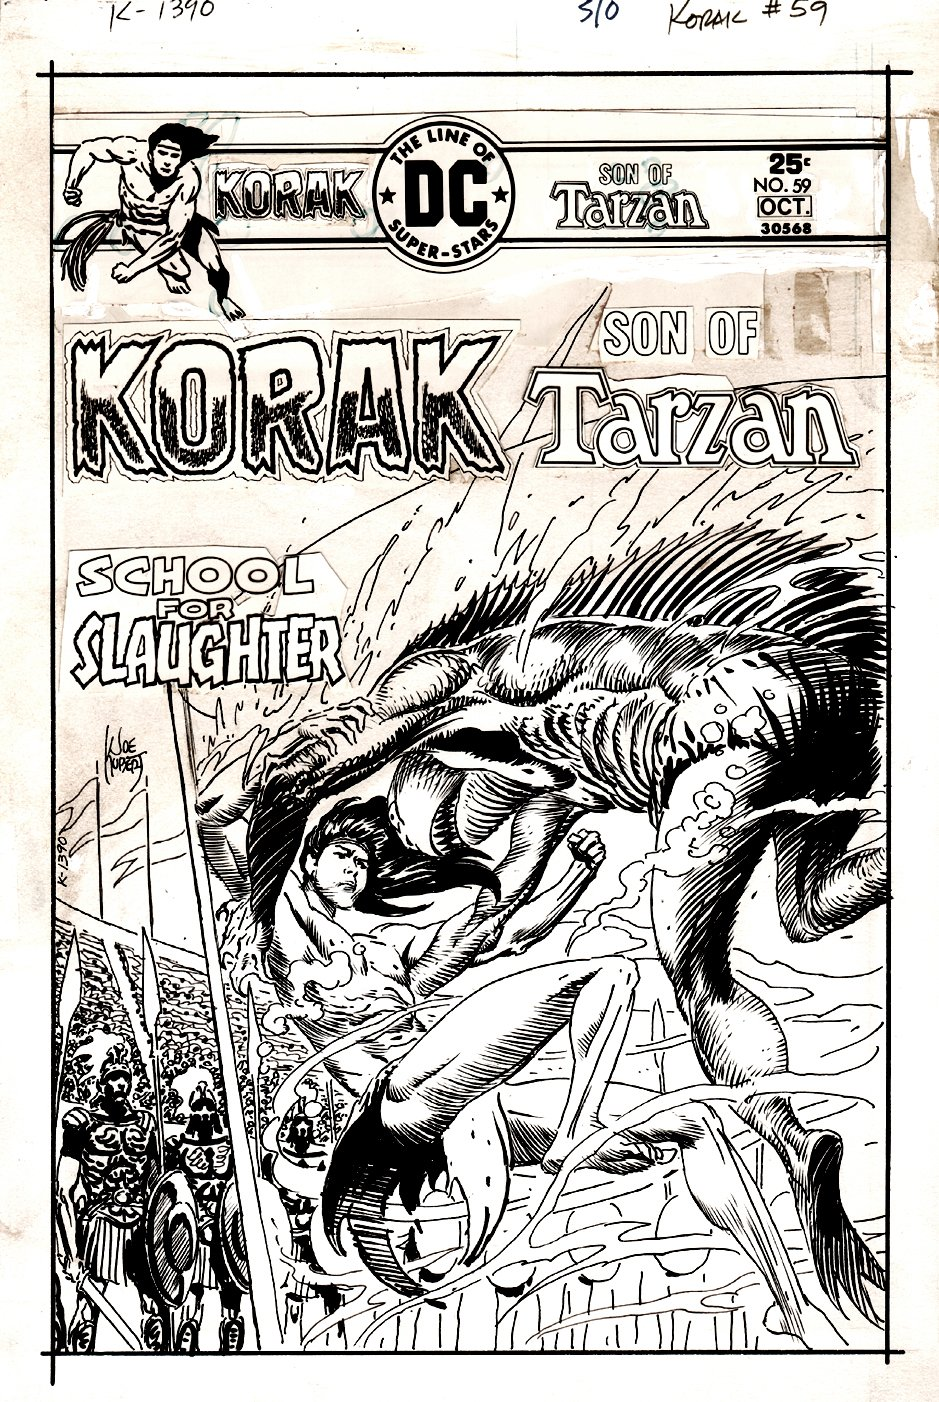 Korak, Son of Tarzan #59 Cover (1975)